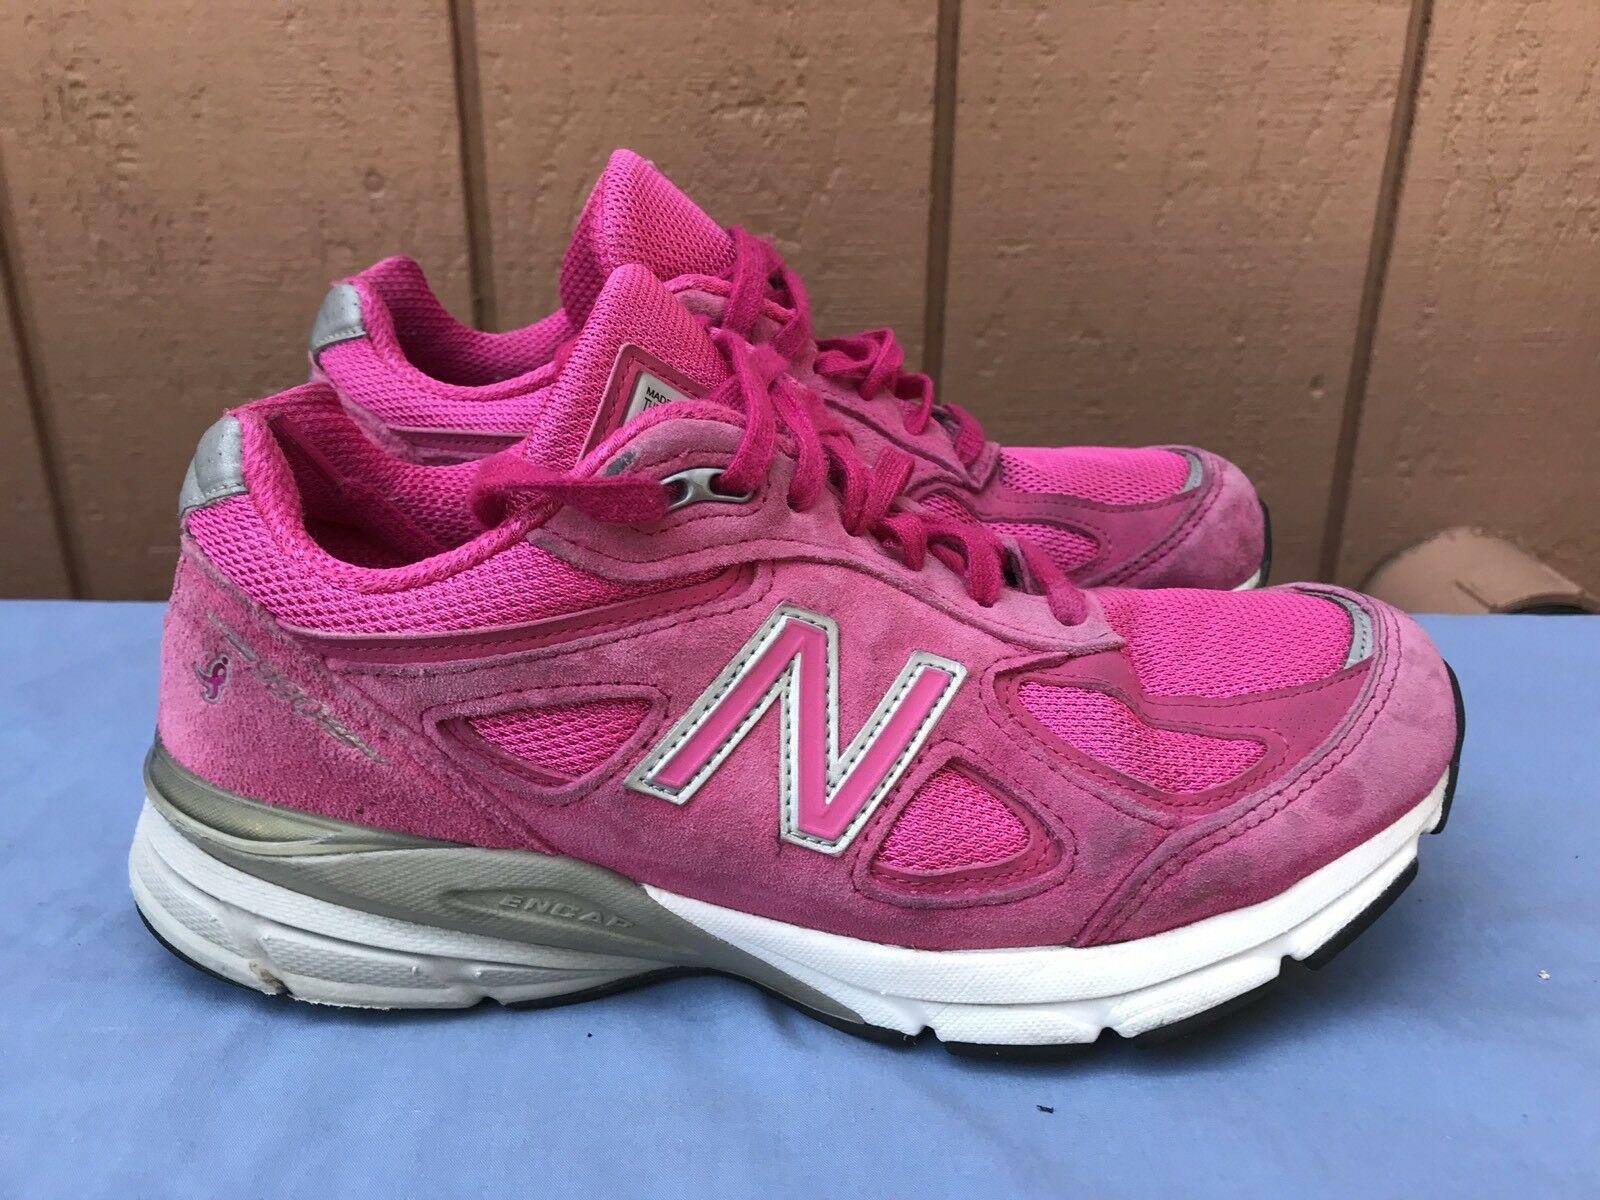 New Balance 990v4 Pink Ribbon Komen Pink